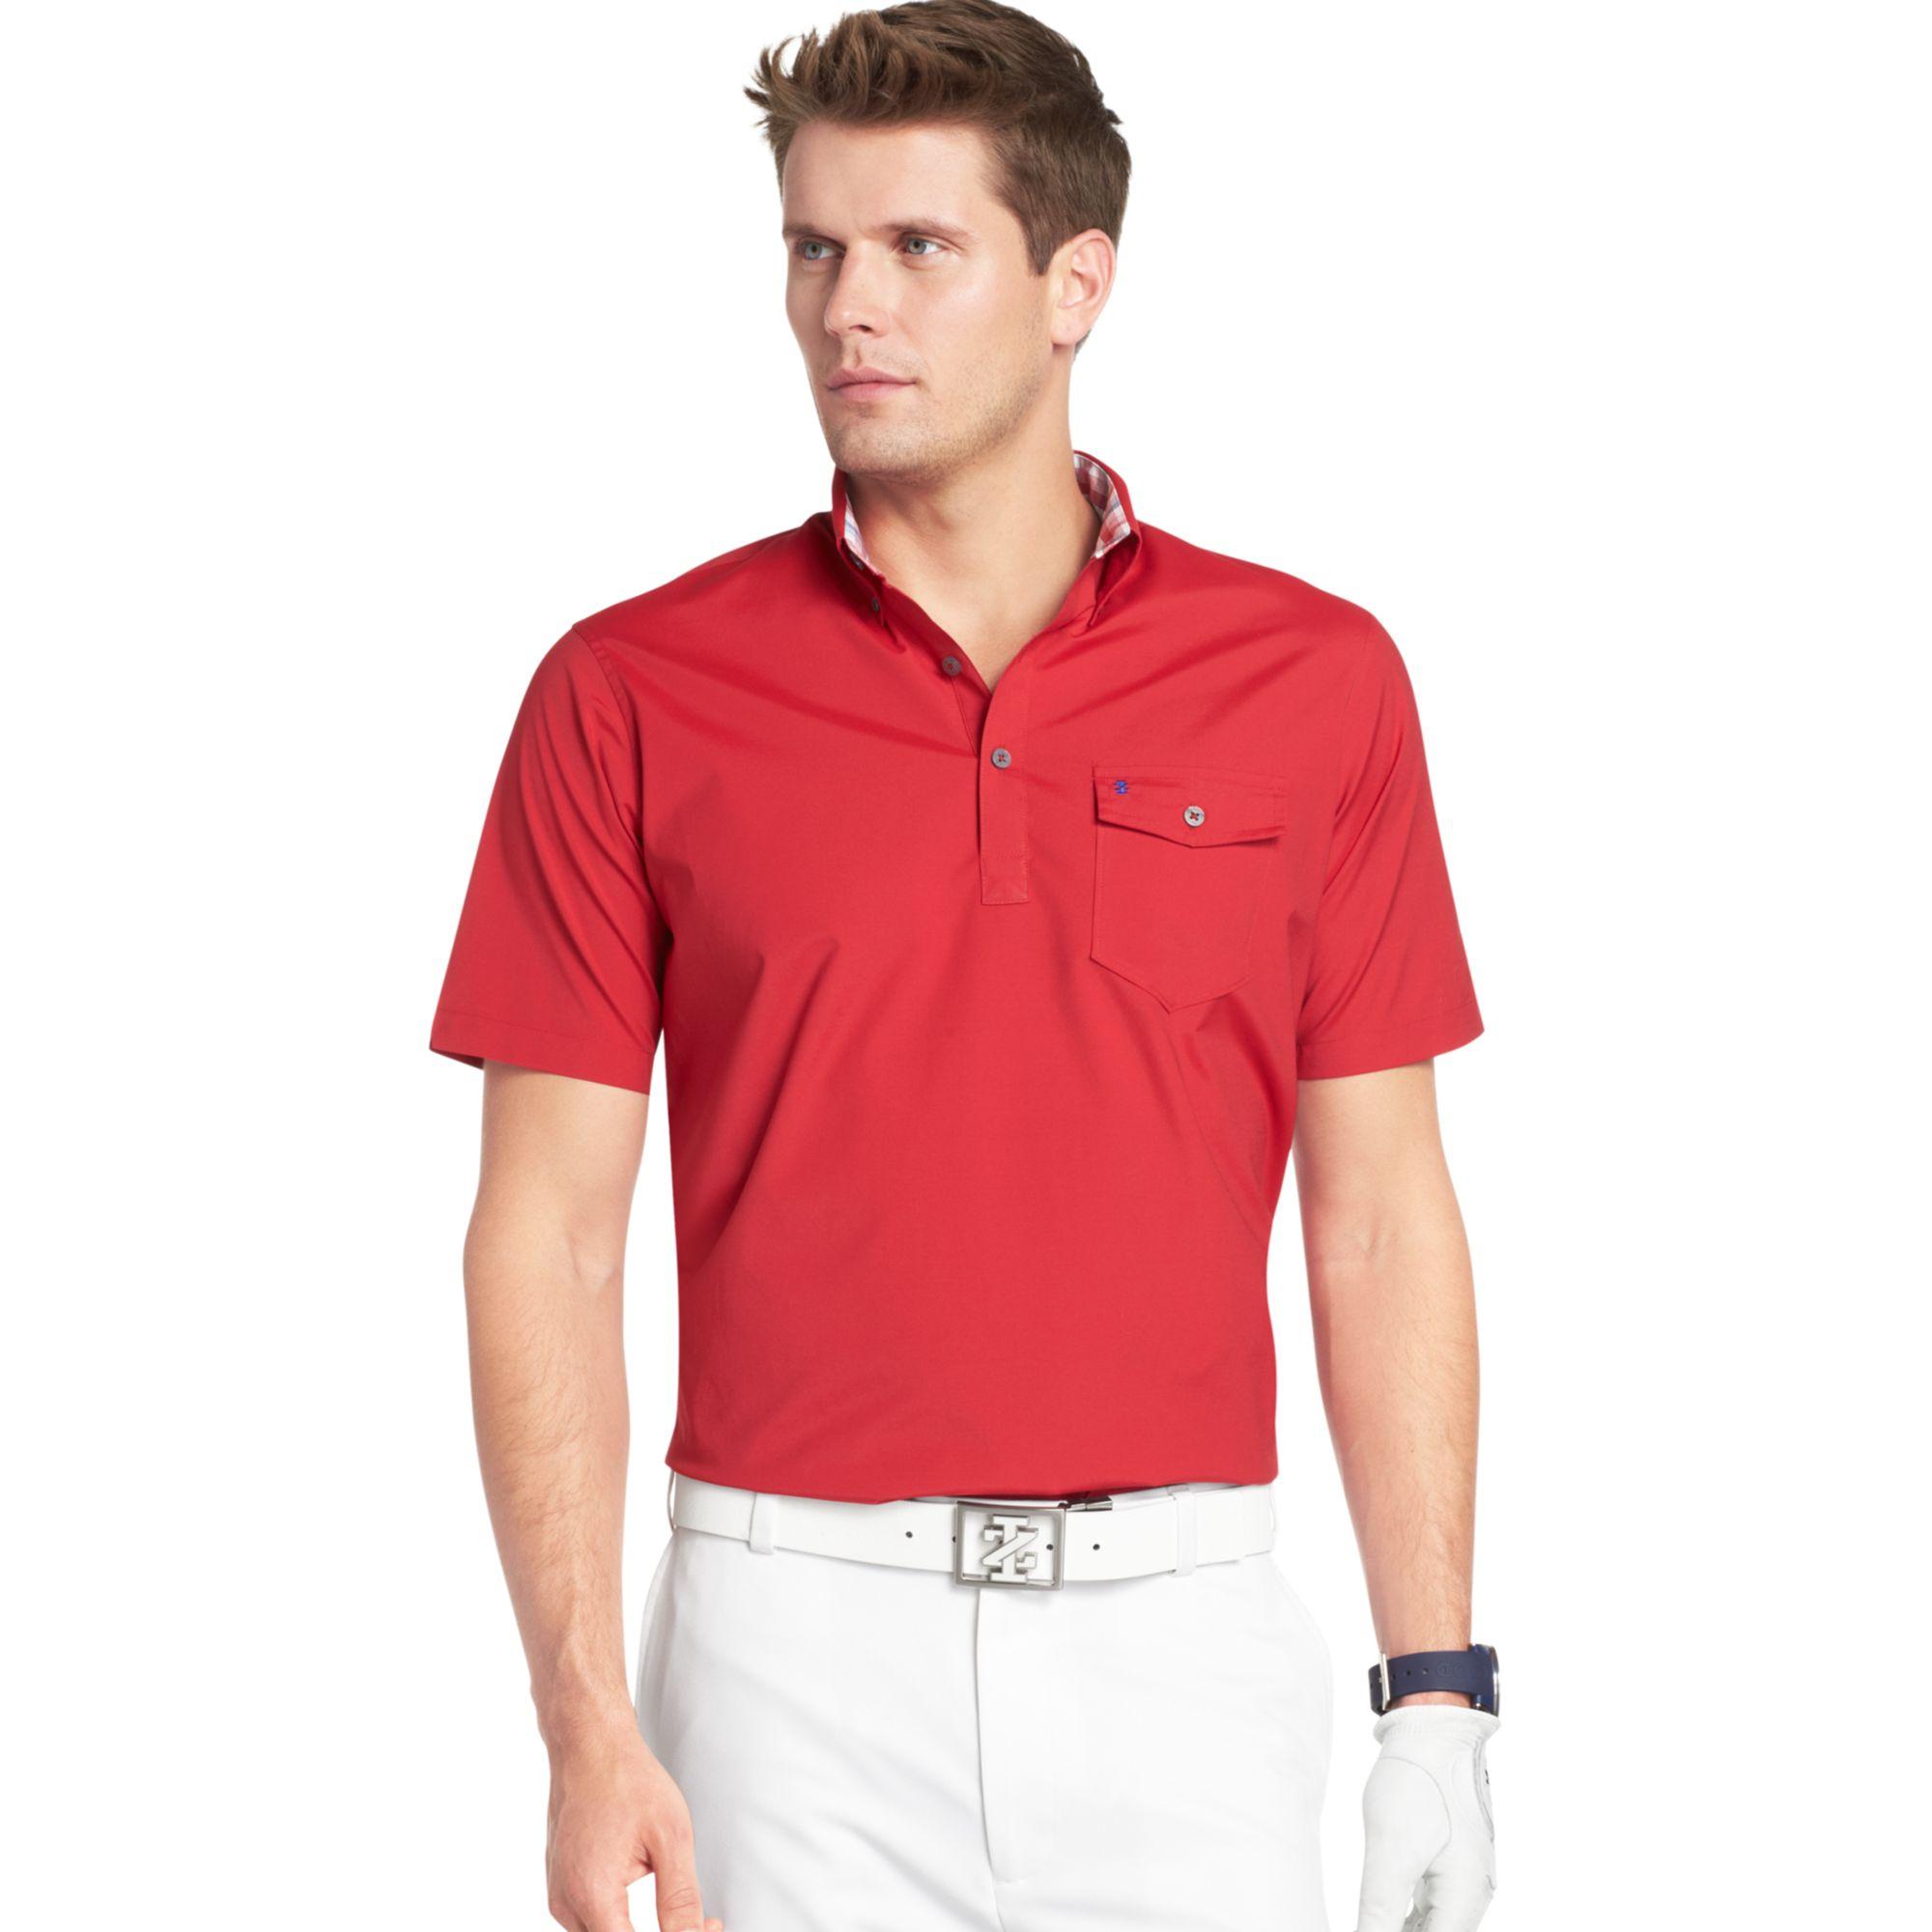 Izod Short Sleeve Popover Performance Golf Shirt With